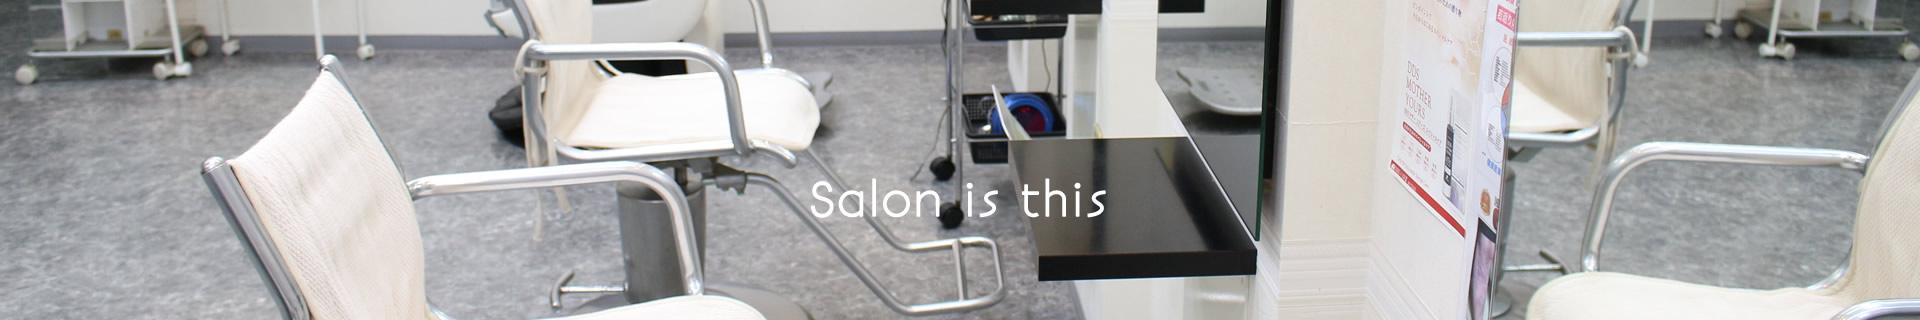 Salon is this